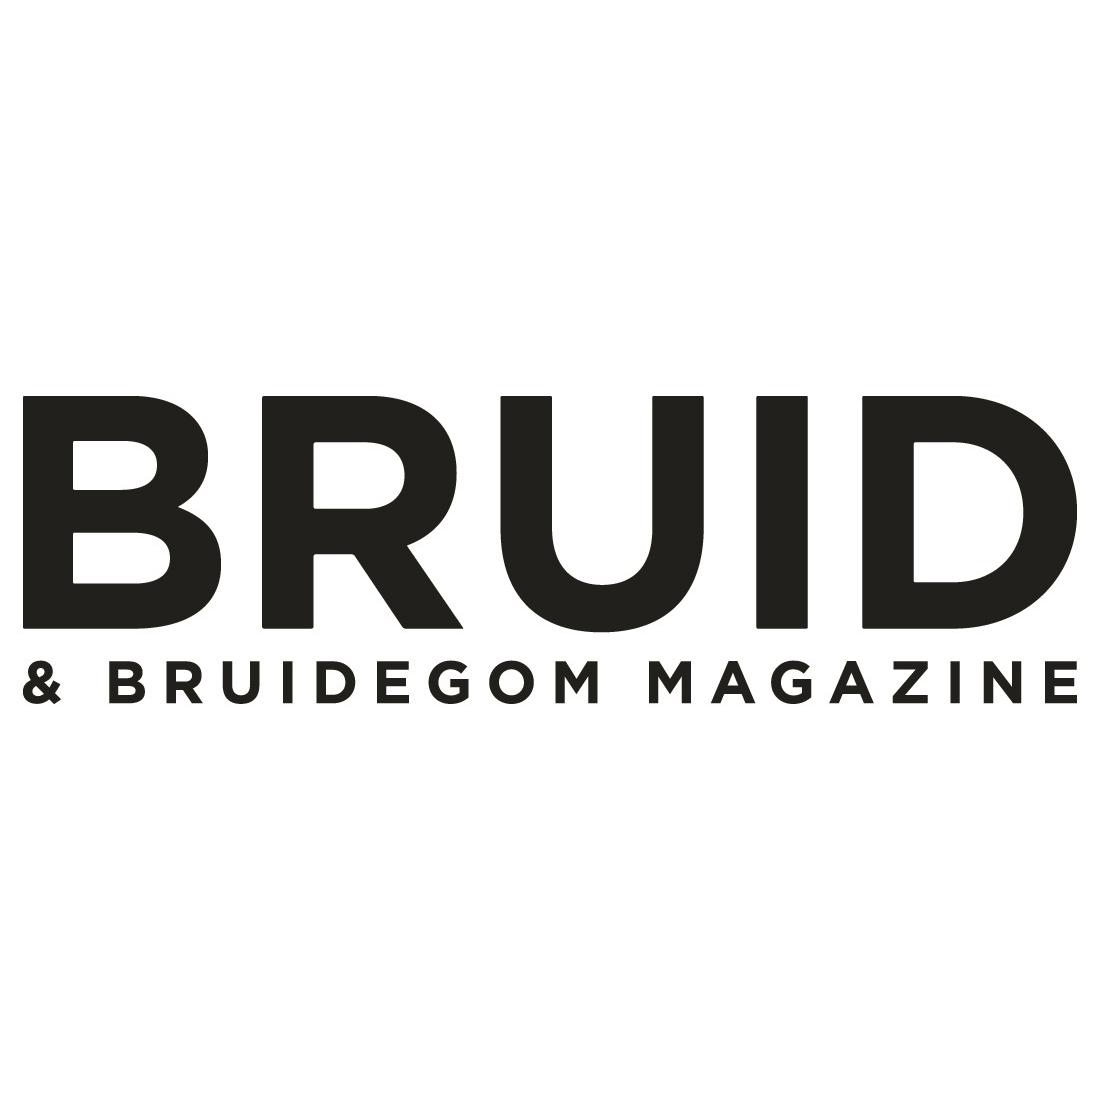 Bruid & Bruidegom Magazine logo